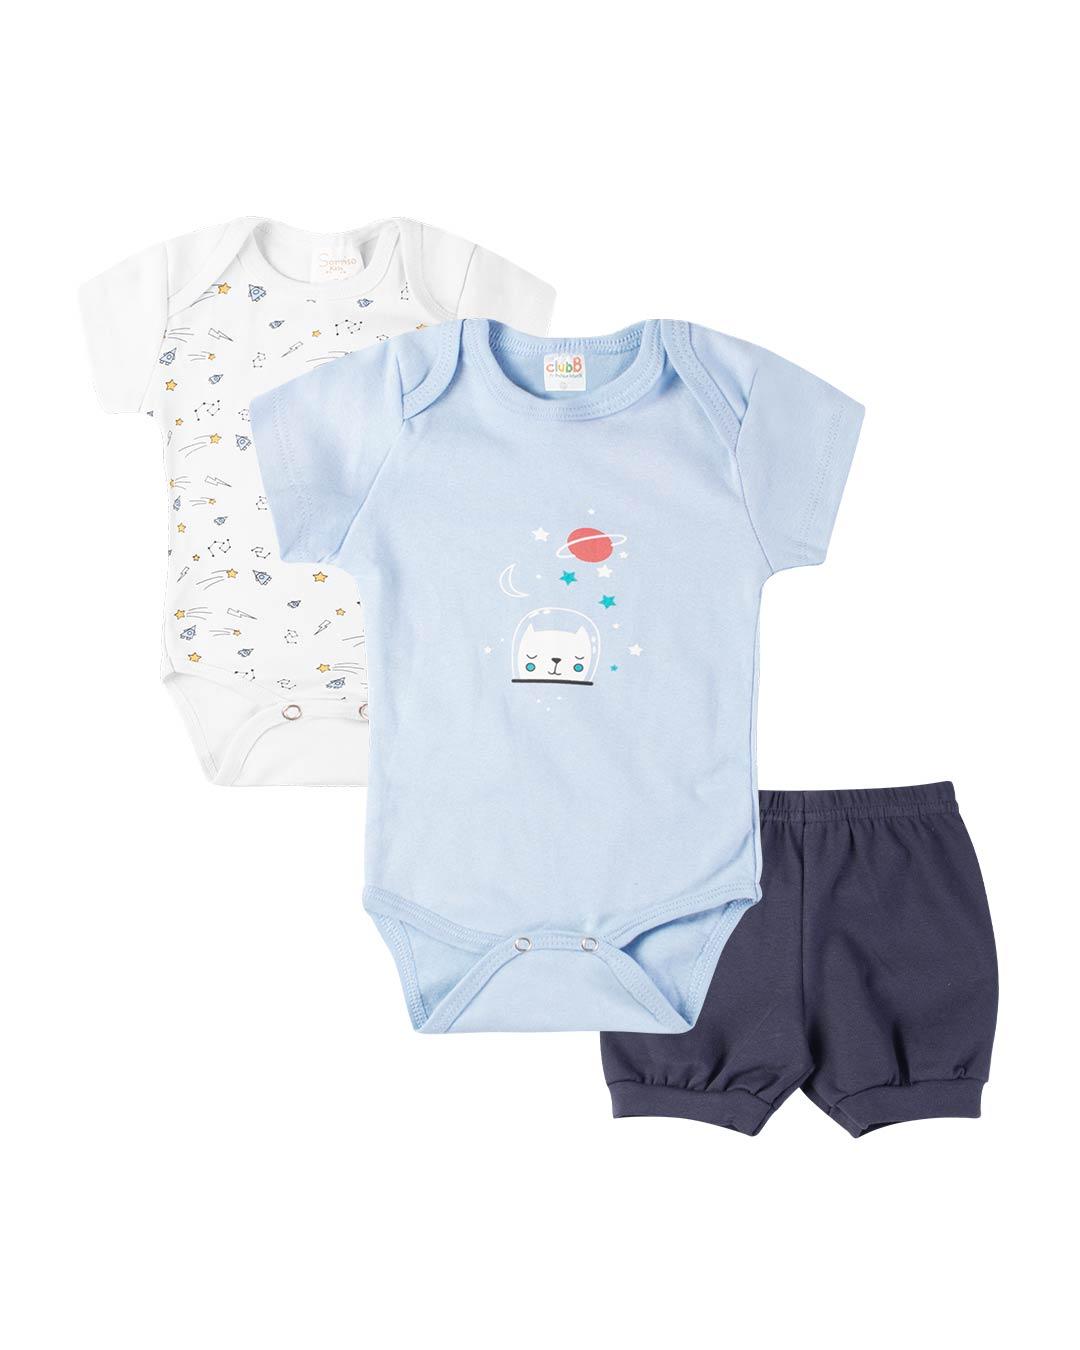 Kit Body 3 Peças com Bermuda Gatinho Astronauta Azul - Sorriso Kids